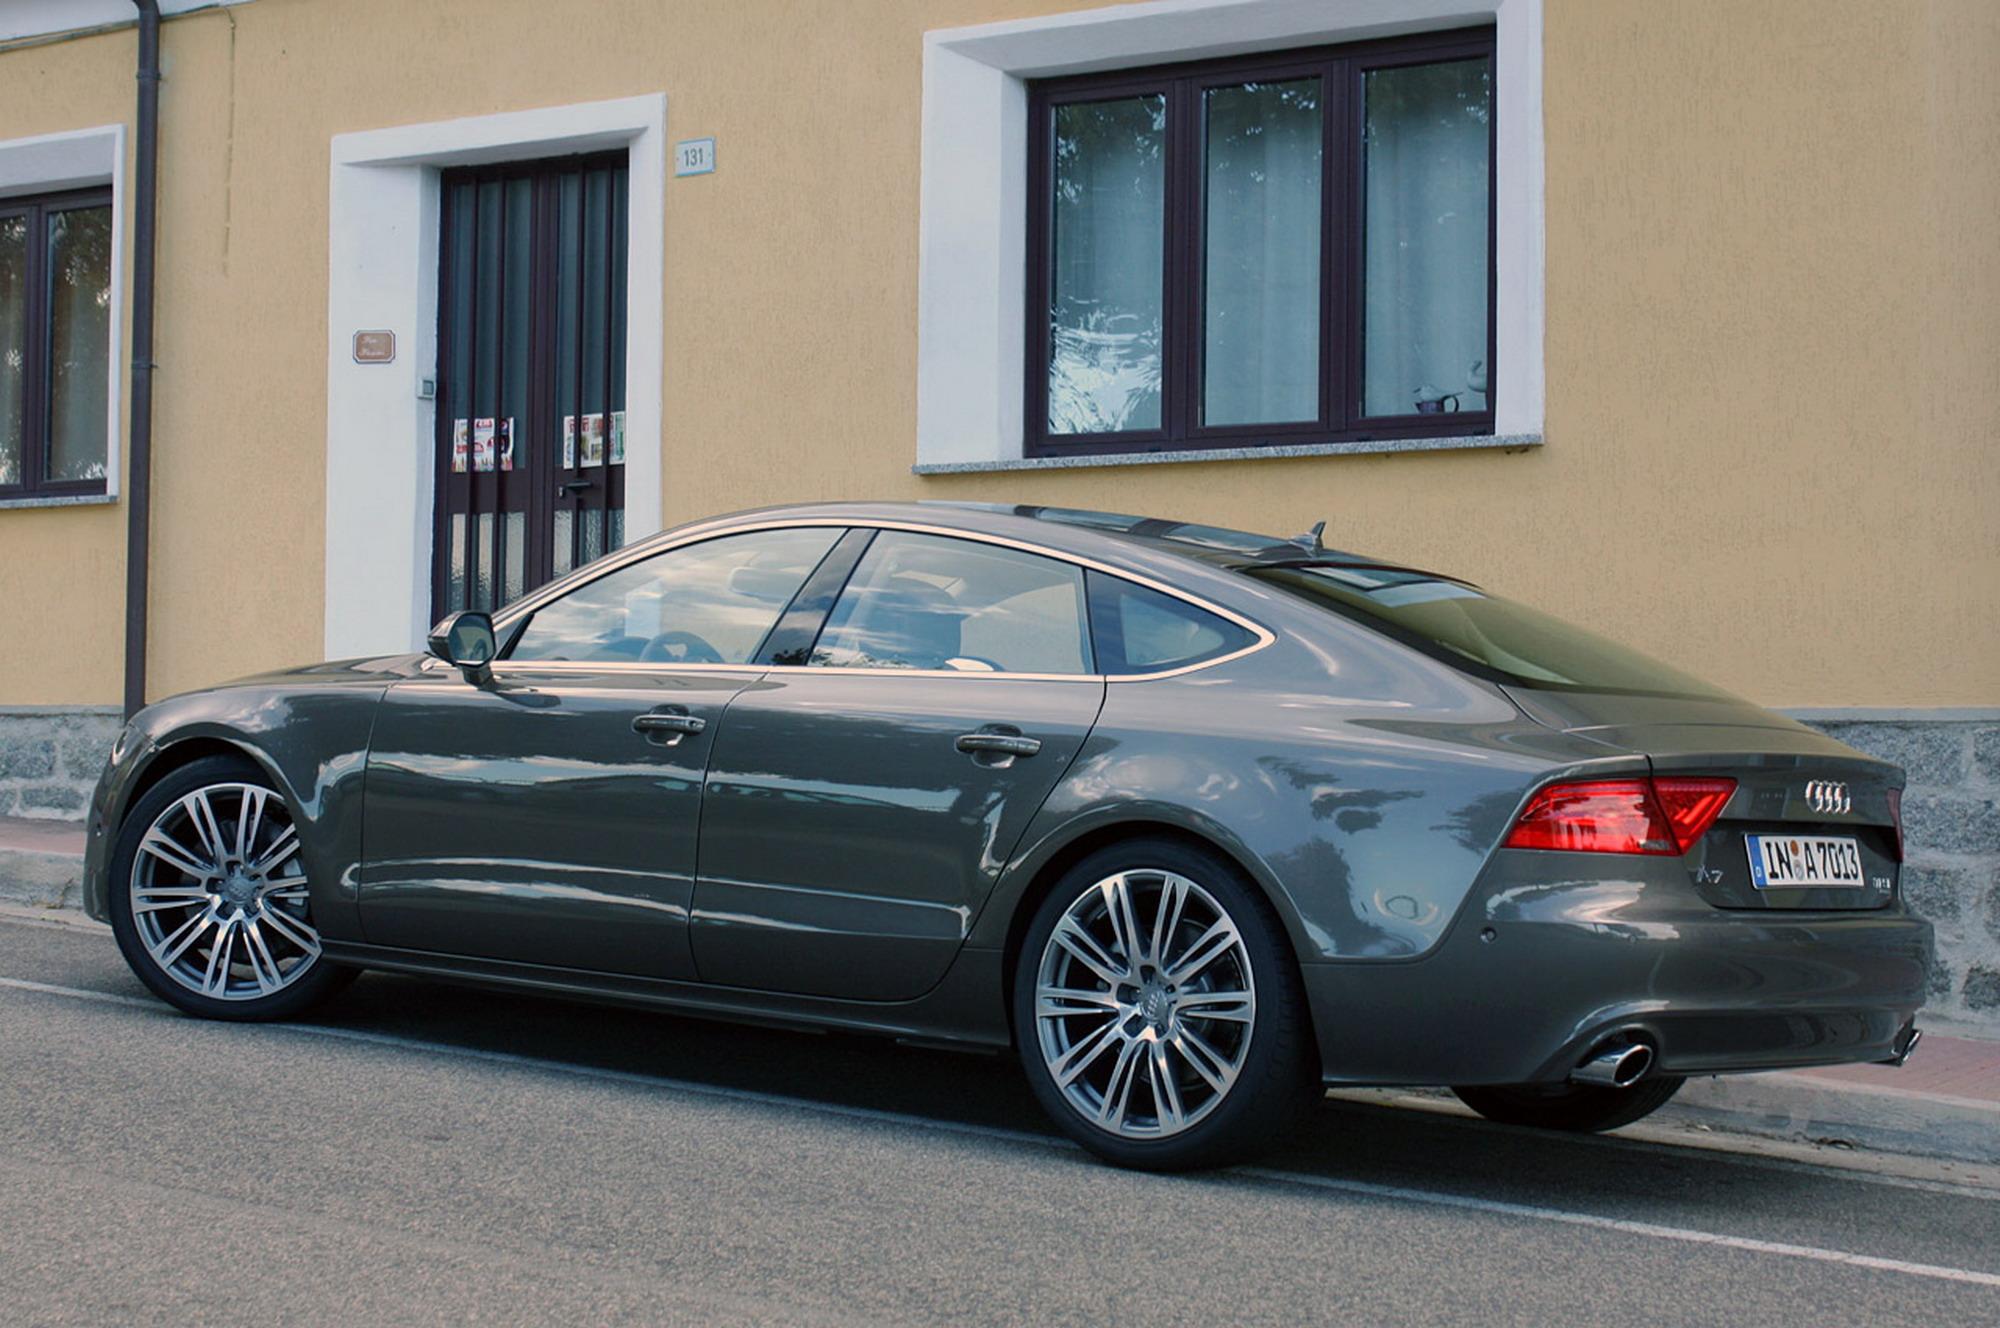 2012 Audi A7 Image 21